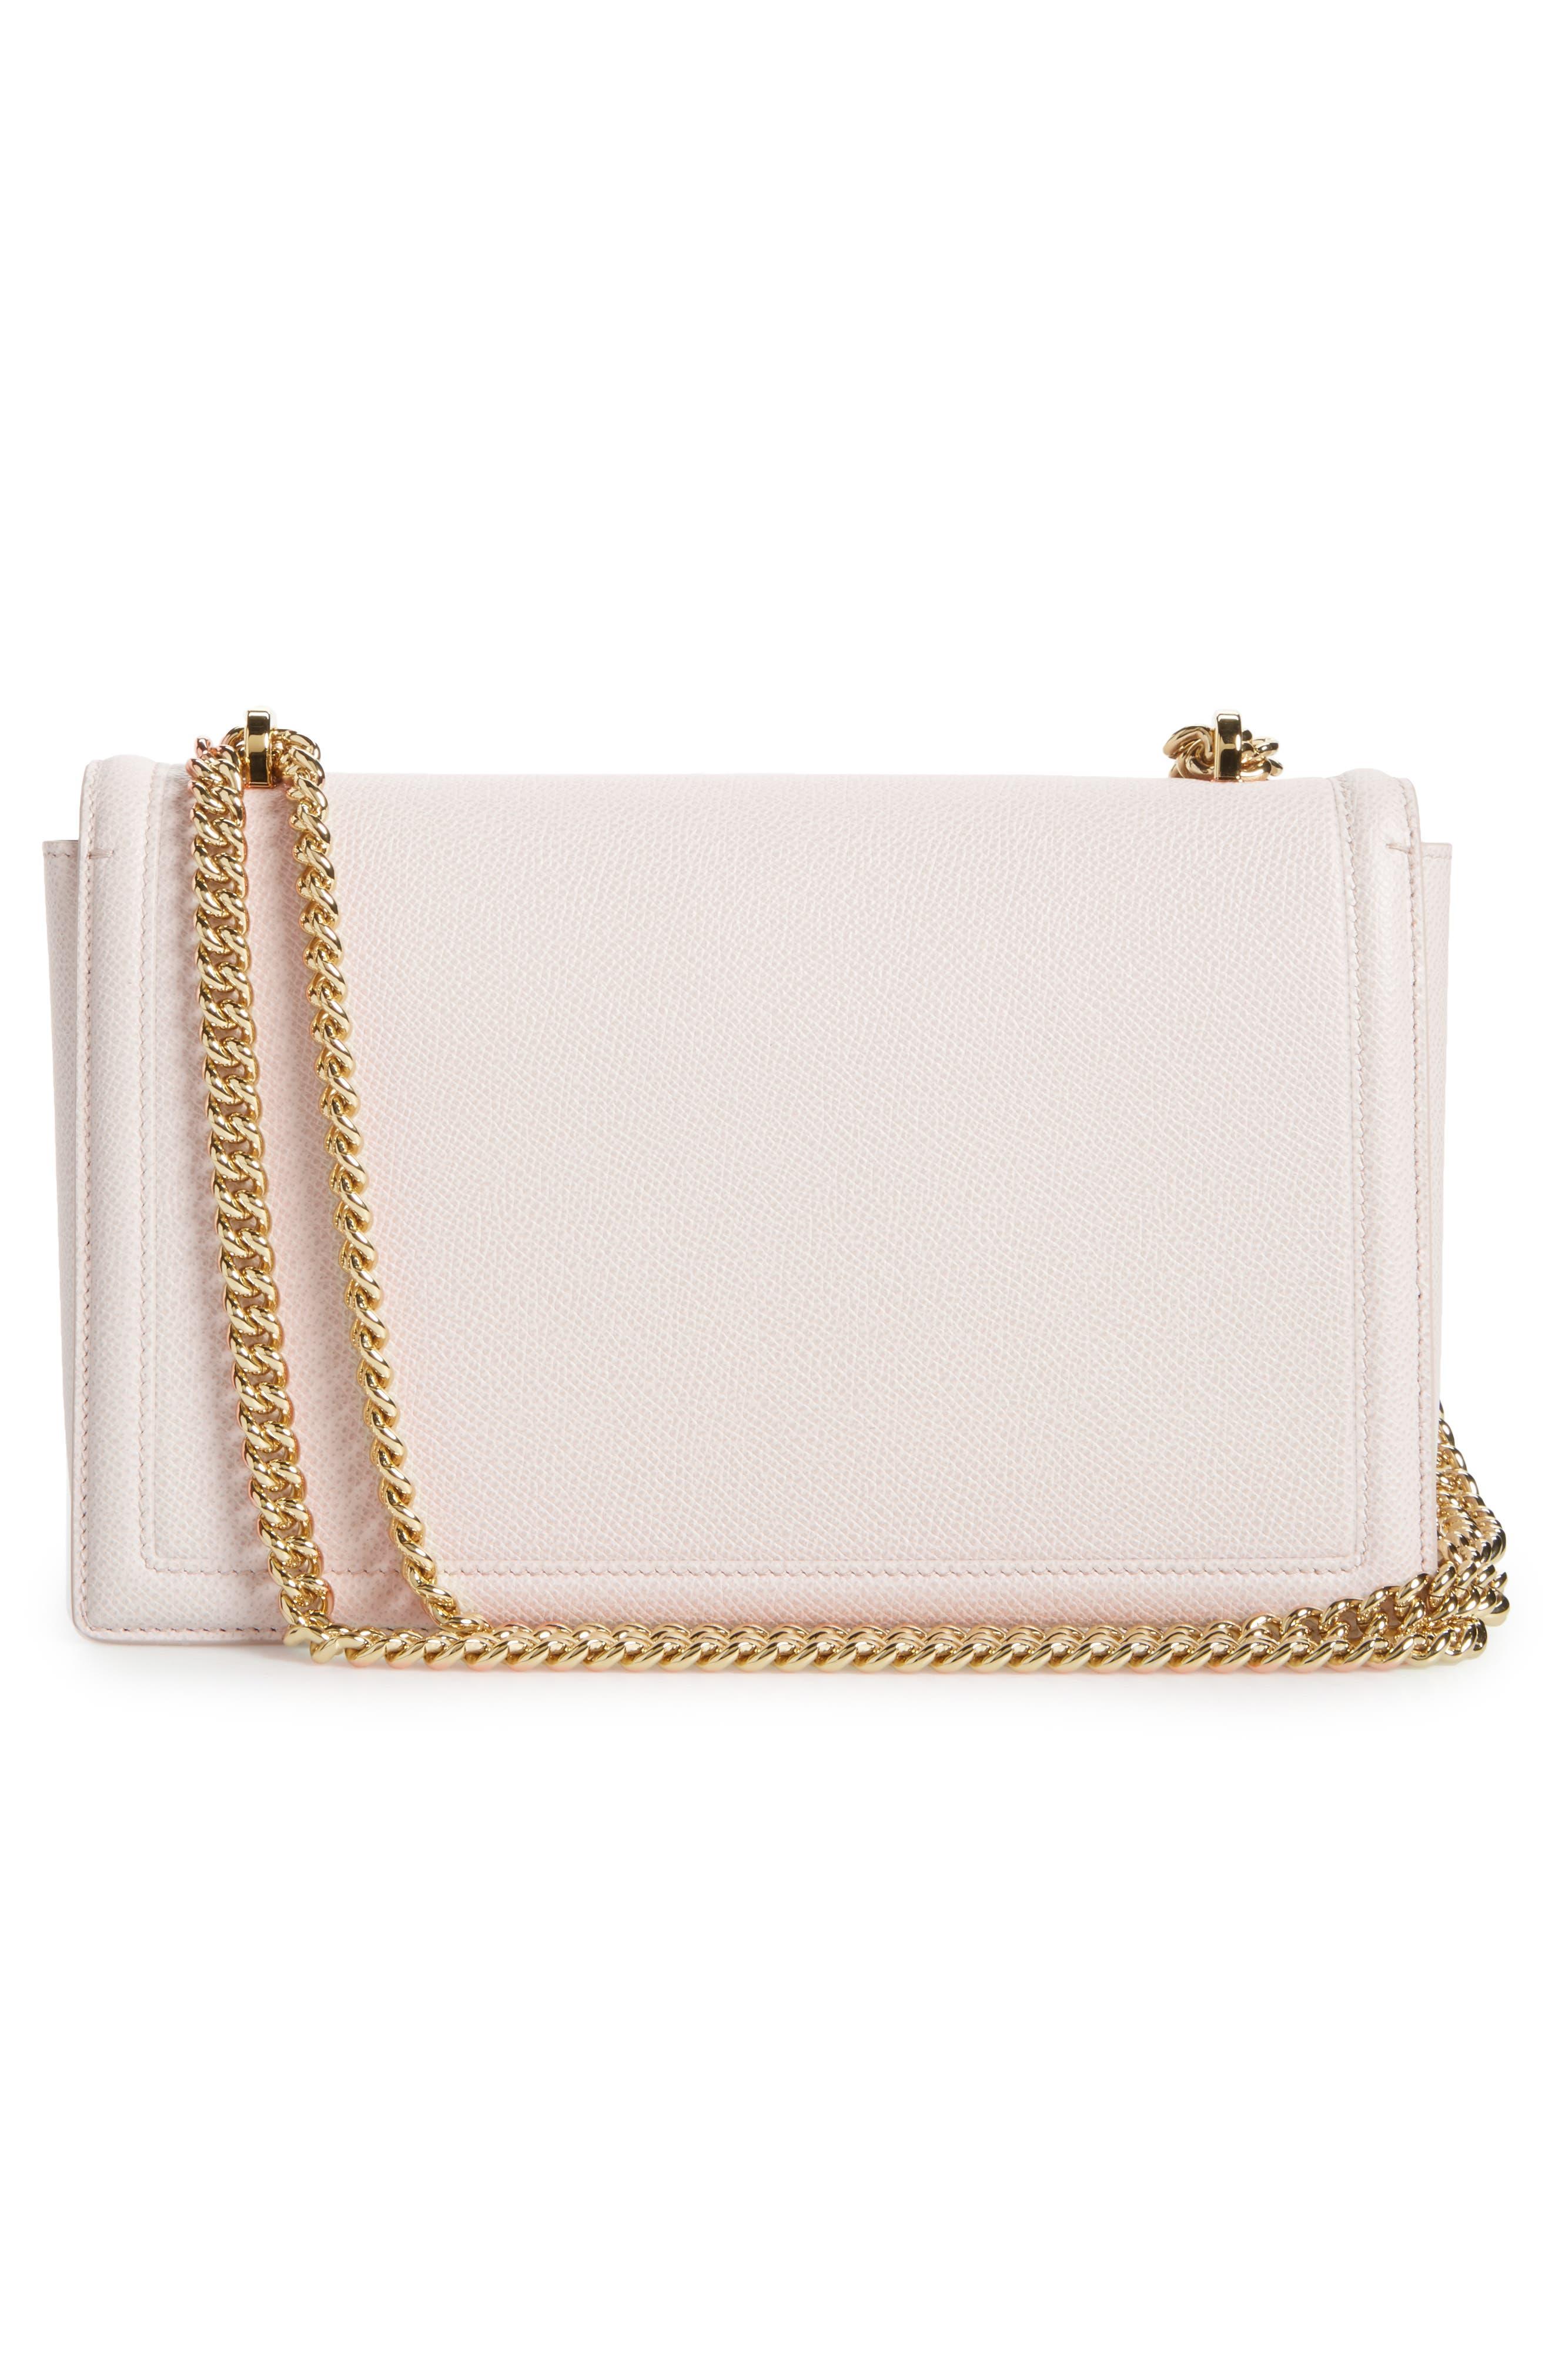 Medium Ginny Leather Shoulder Bag,                             Alternate thumbnail 3, color,                             650